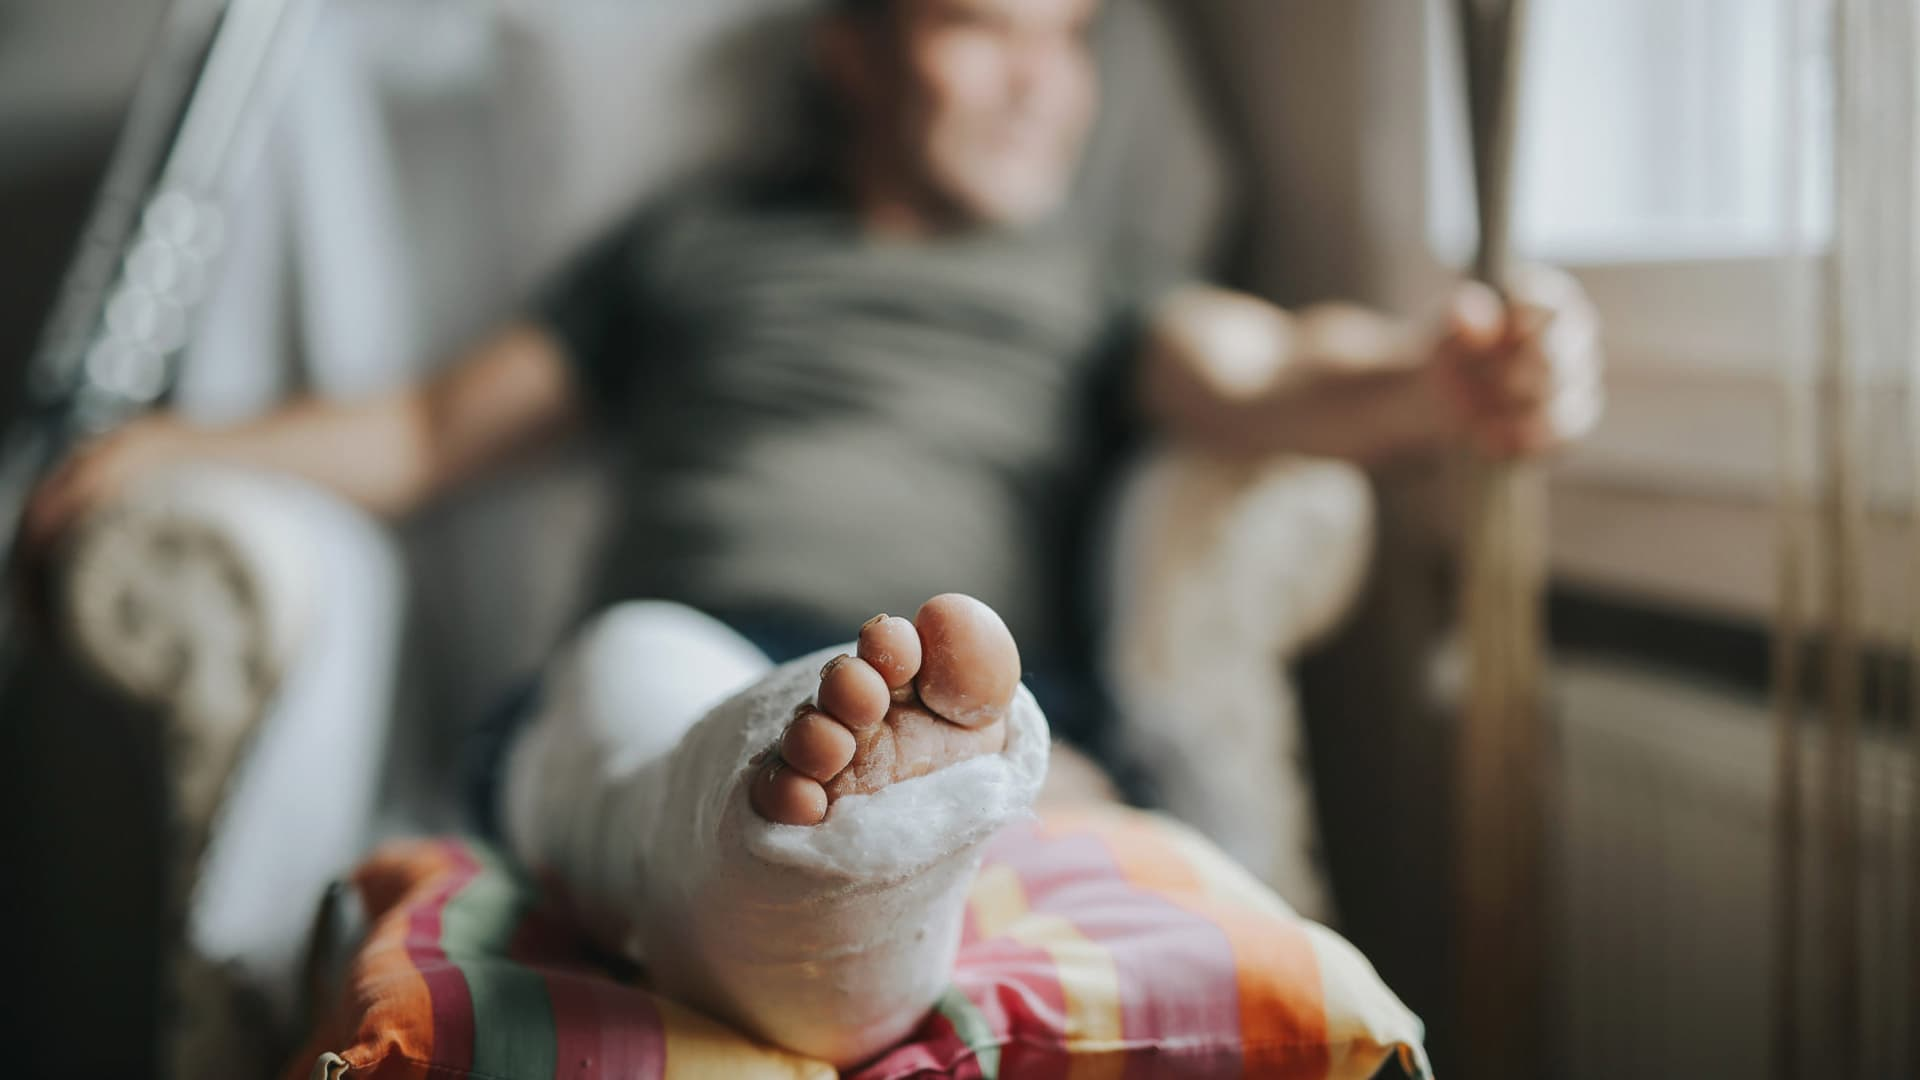 Man with broken leg sitting at home